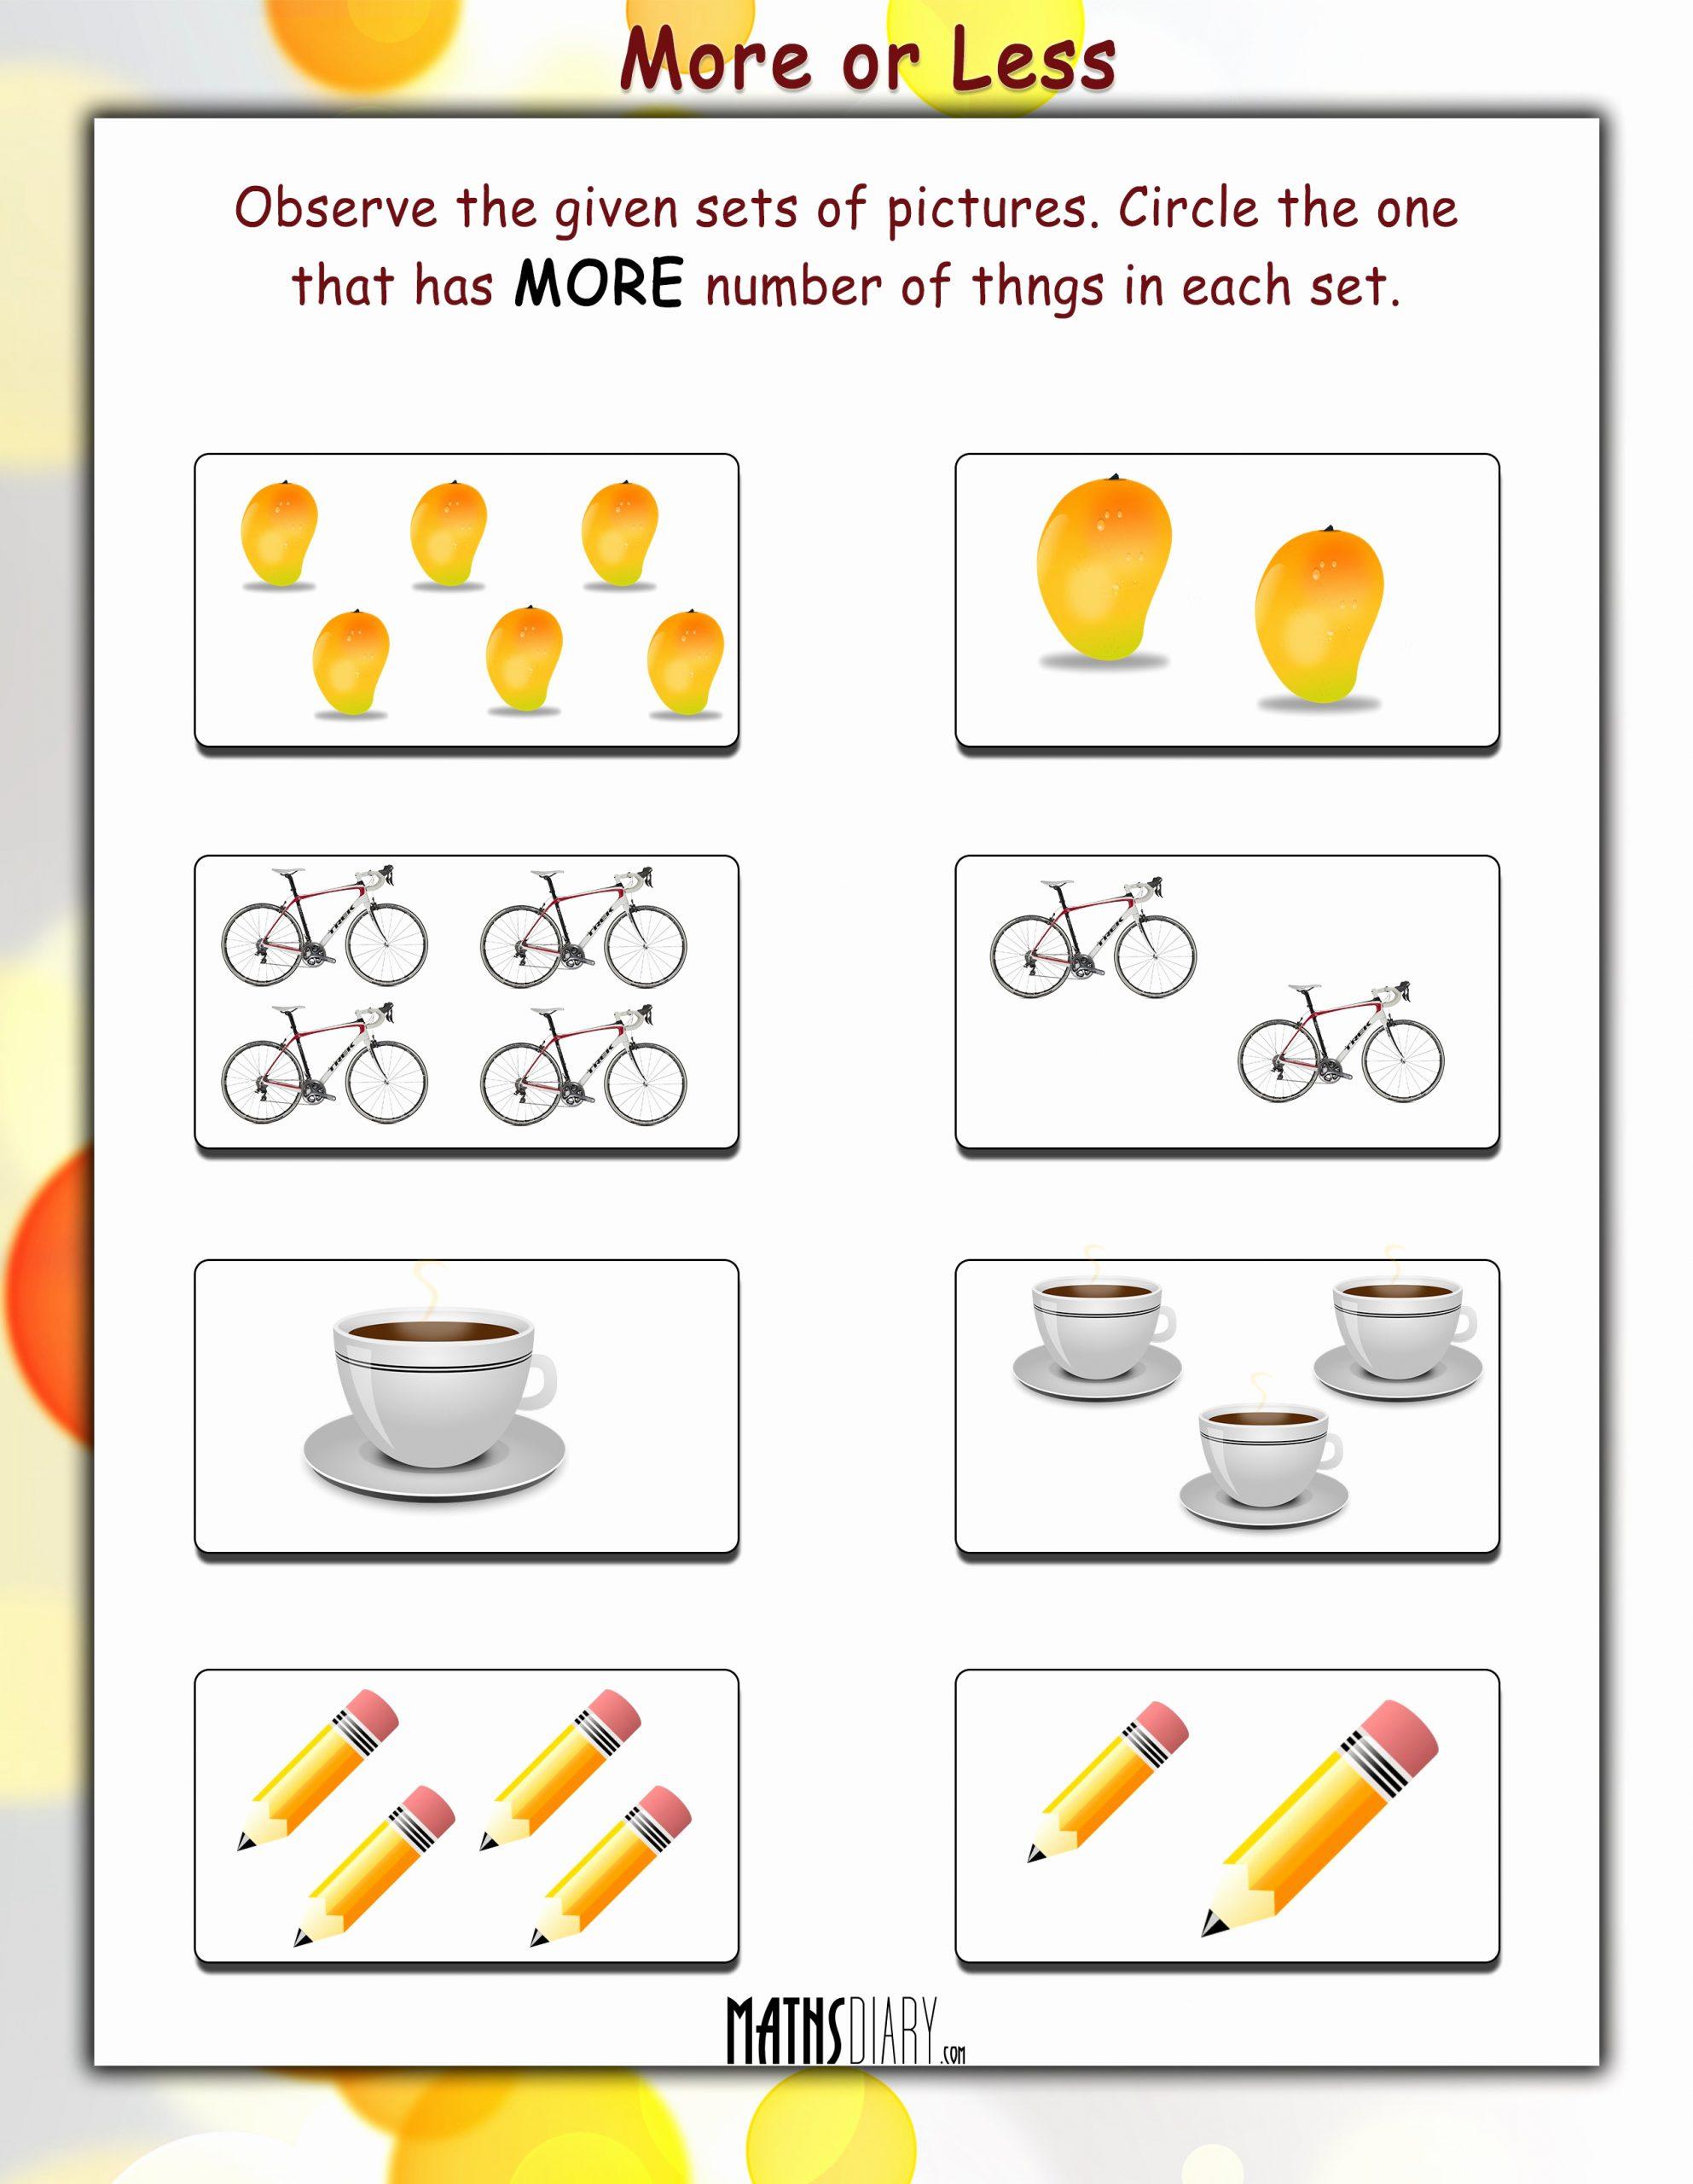 One Less Worksheet Elegant E More Than E Fewer Than Worksheet